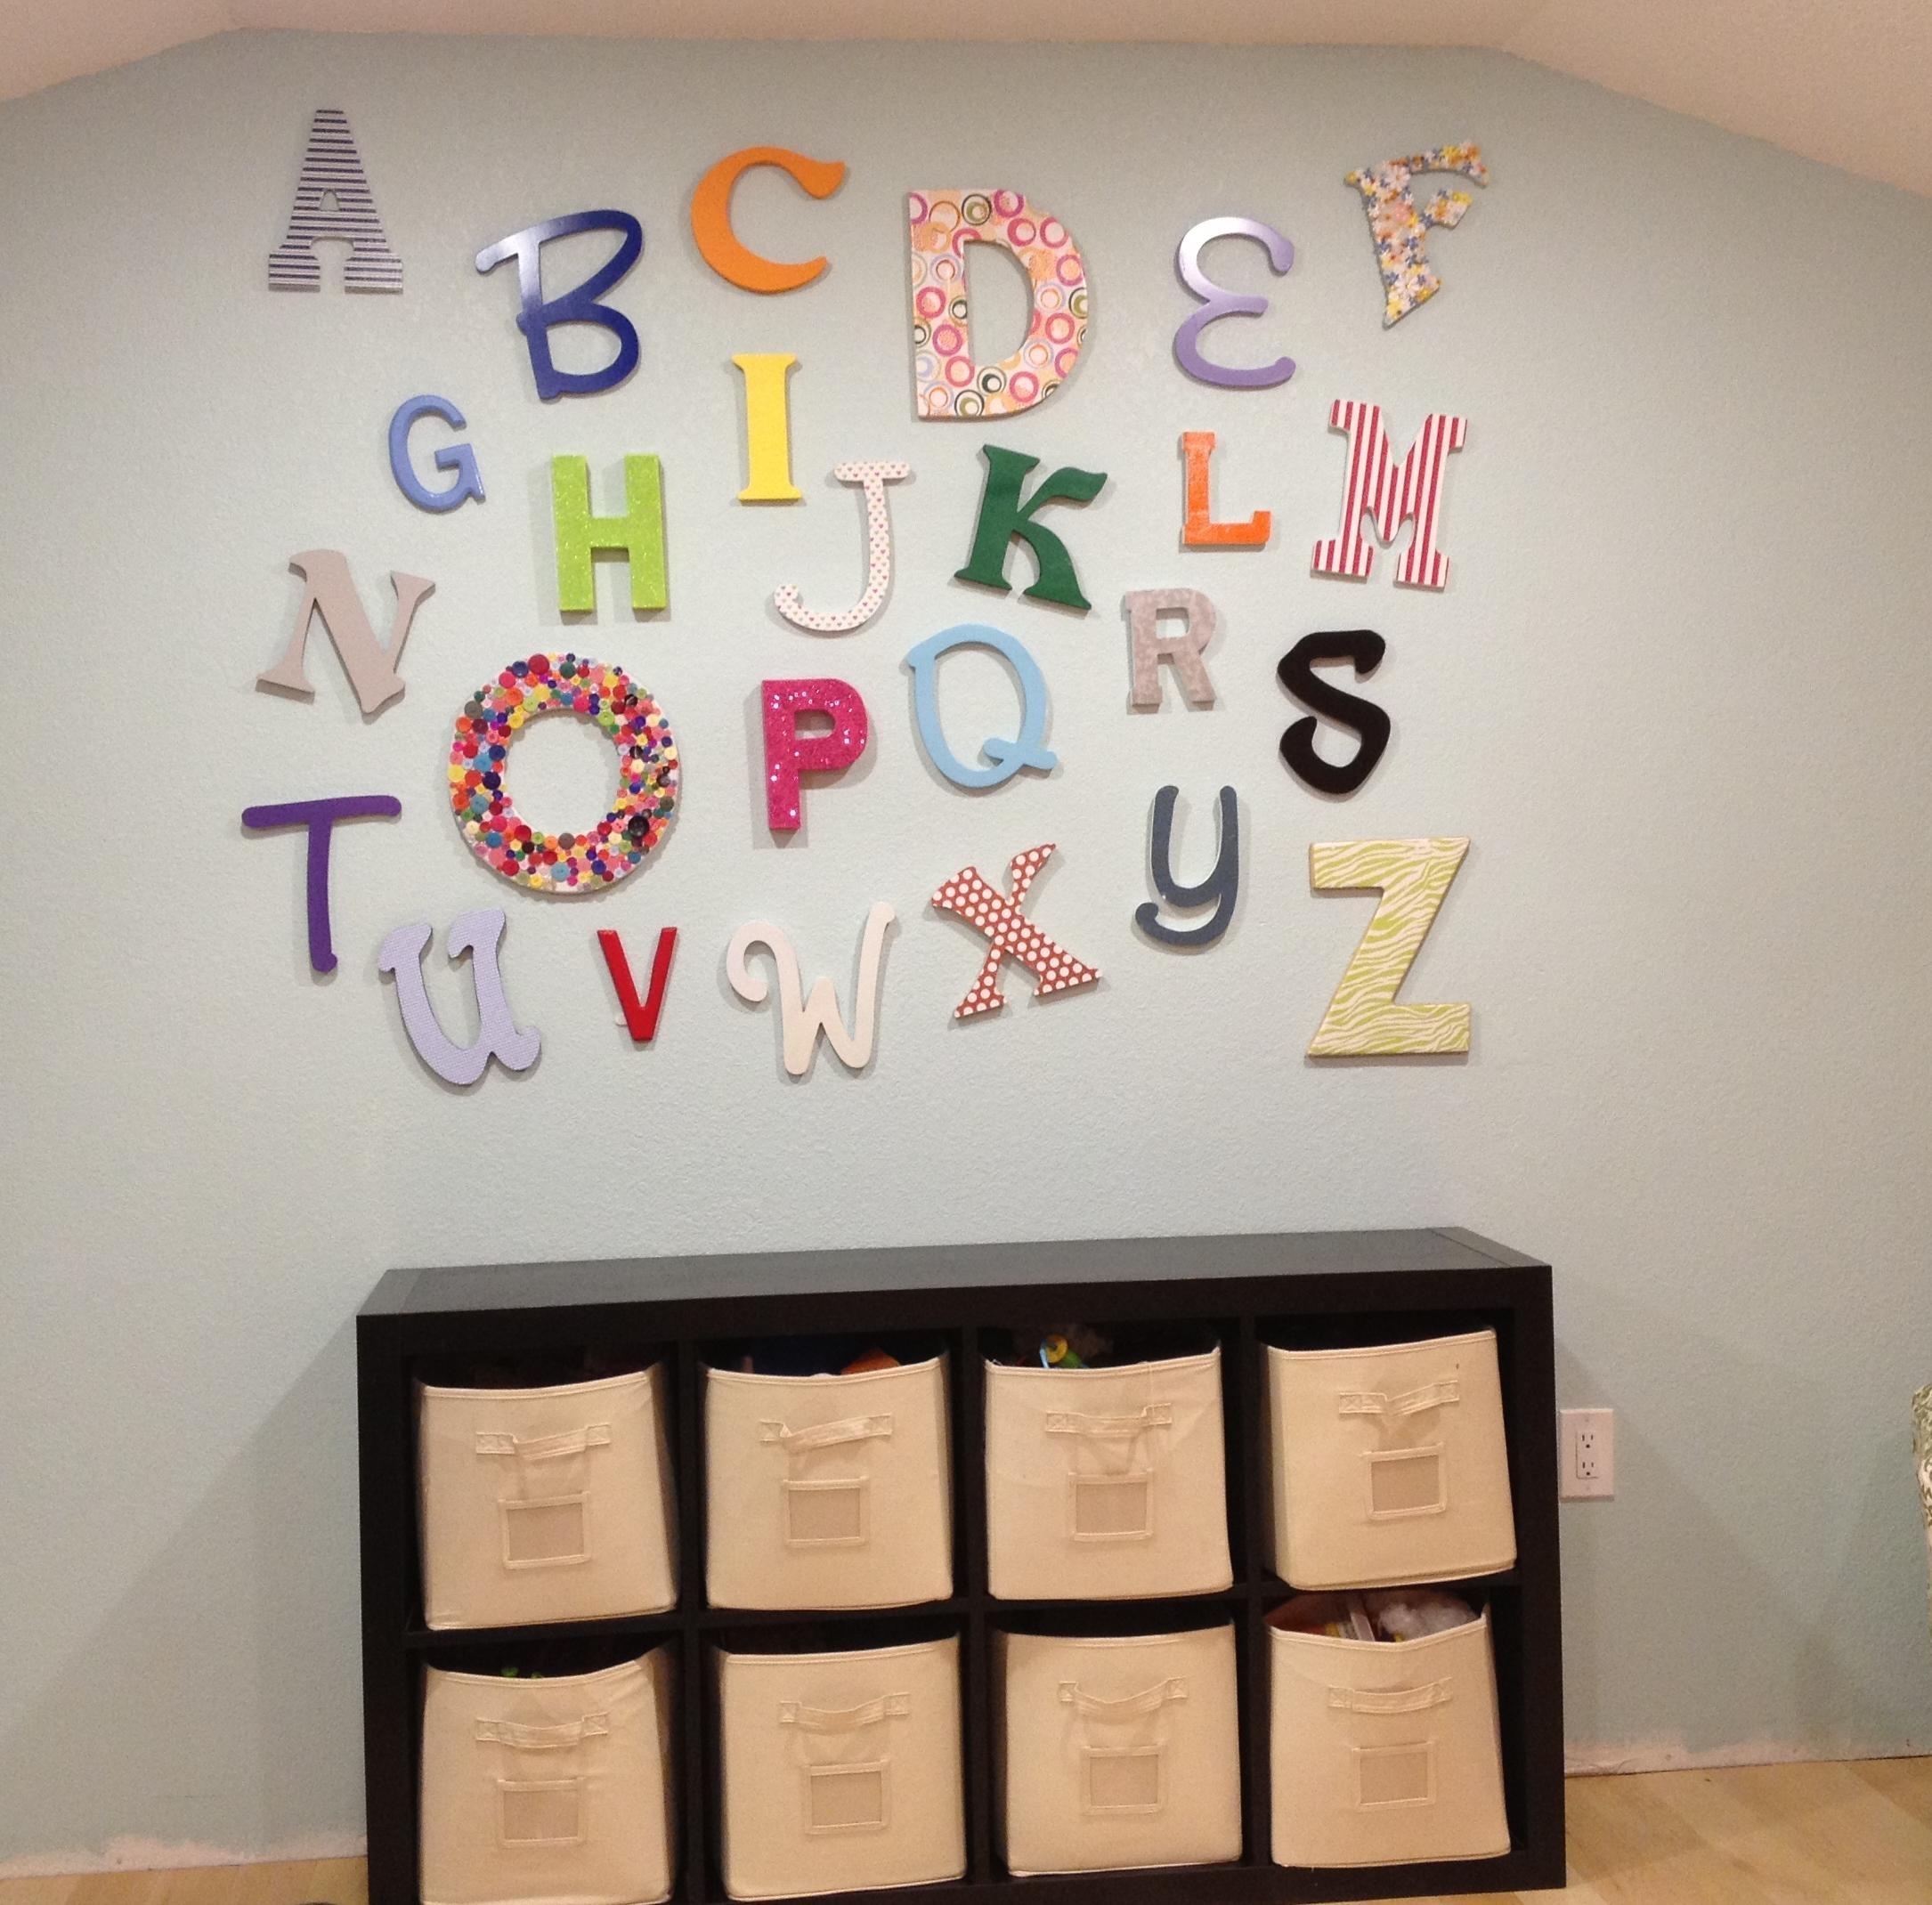 Playroom Wall Decor Ideas #12496 Regarding Wall Art For Playroom (Image 14 of 20)